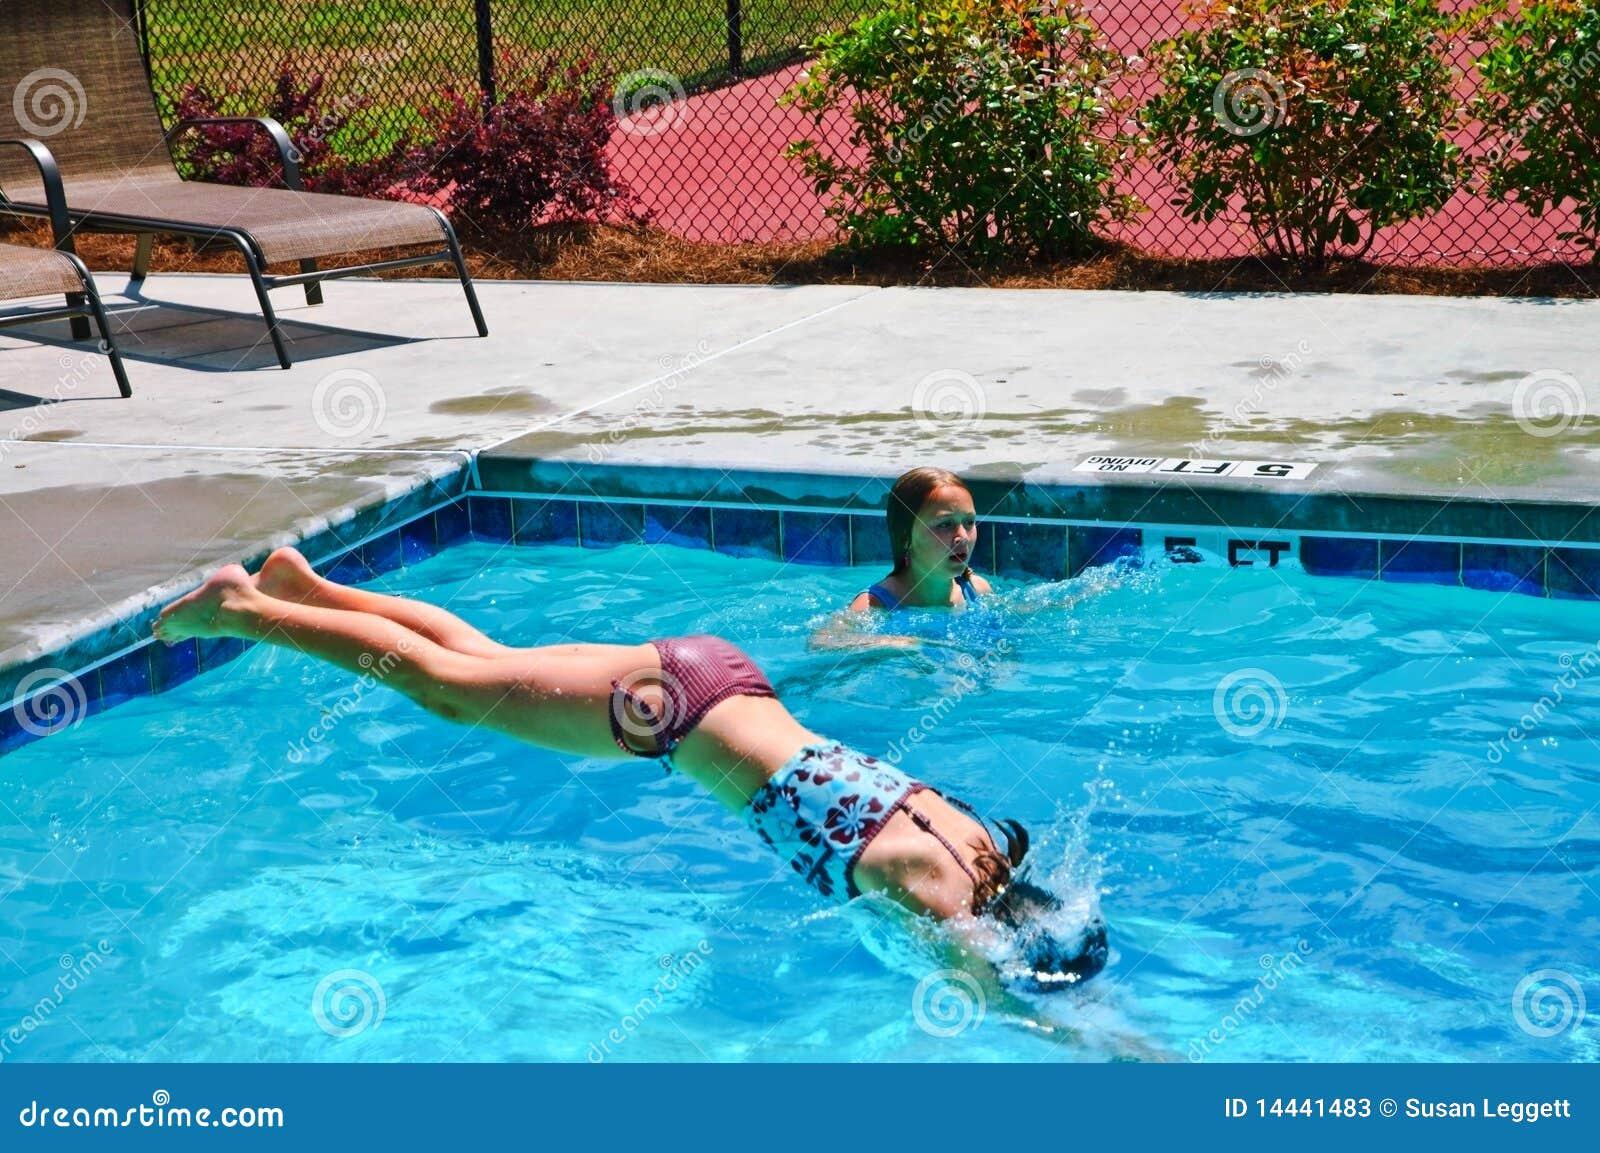 Girl Diving Into A Pool Stock Photos Image 14441483